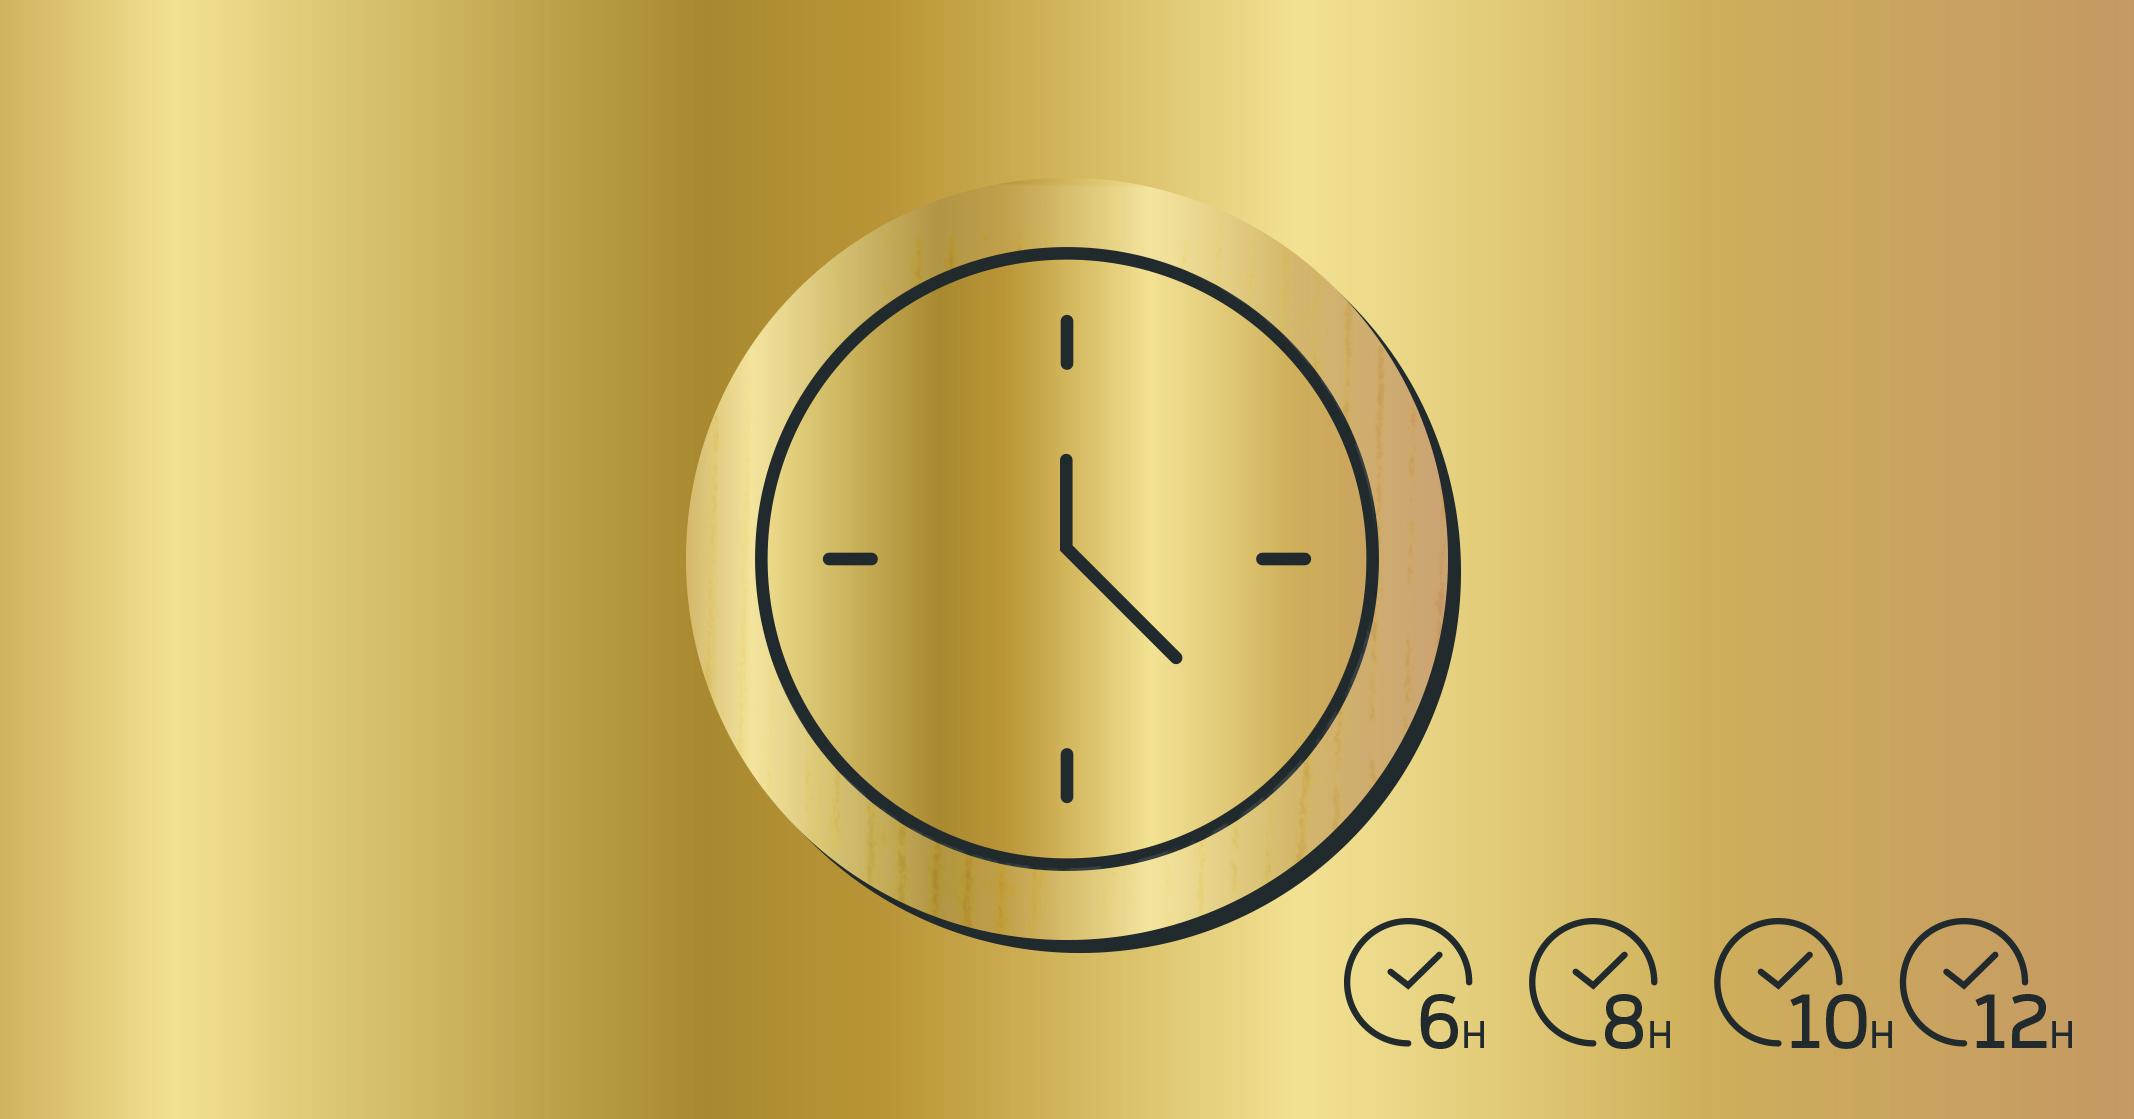 cp007_tempo_6_gold.jpg.jpg